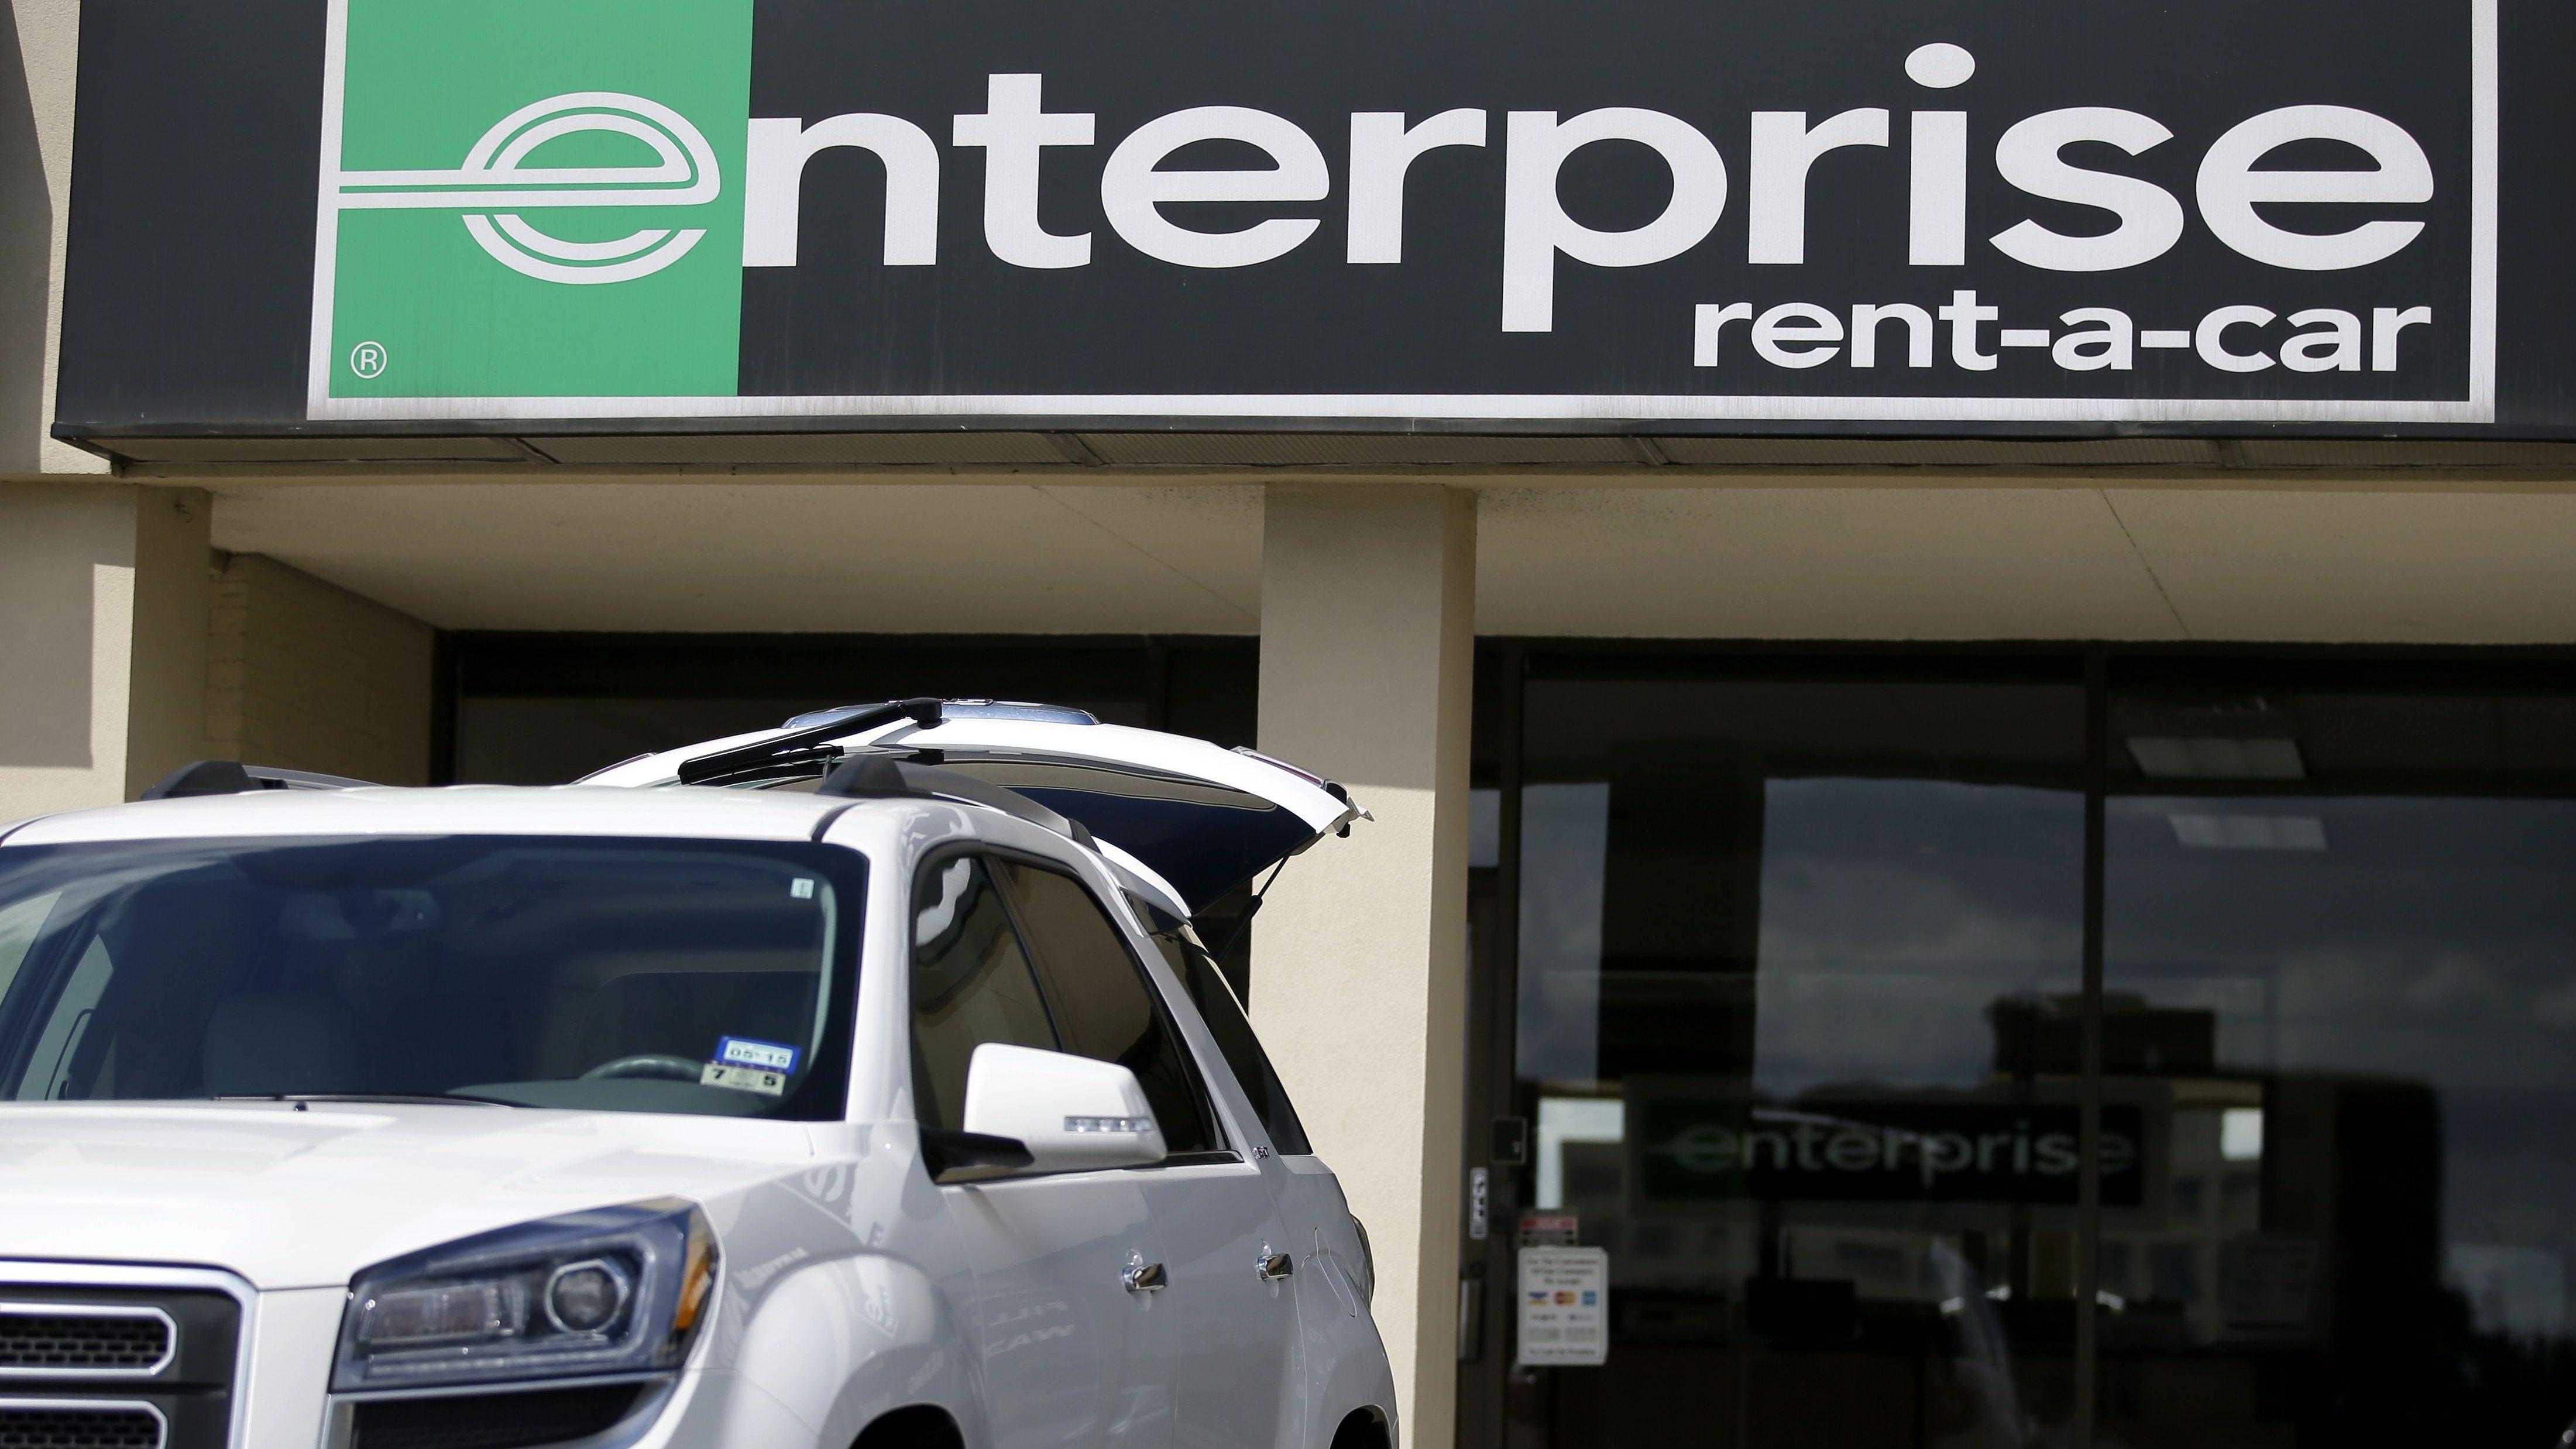 Car Rental Companies Are Terrified Of Startups Like Uber And Turo